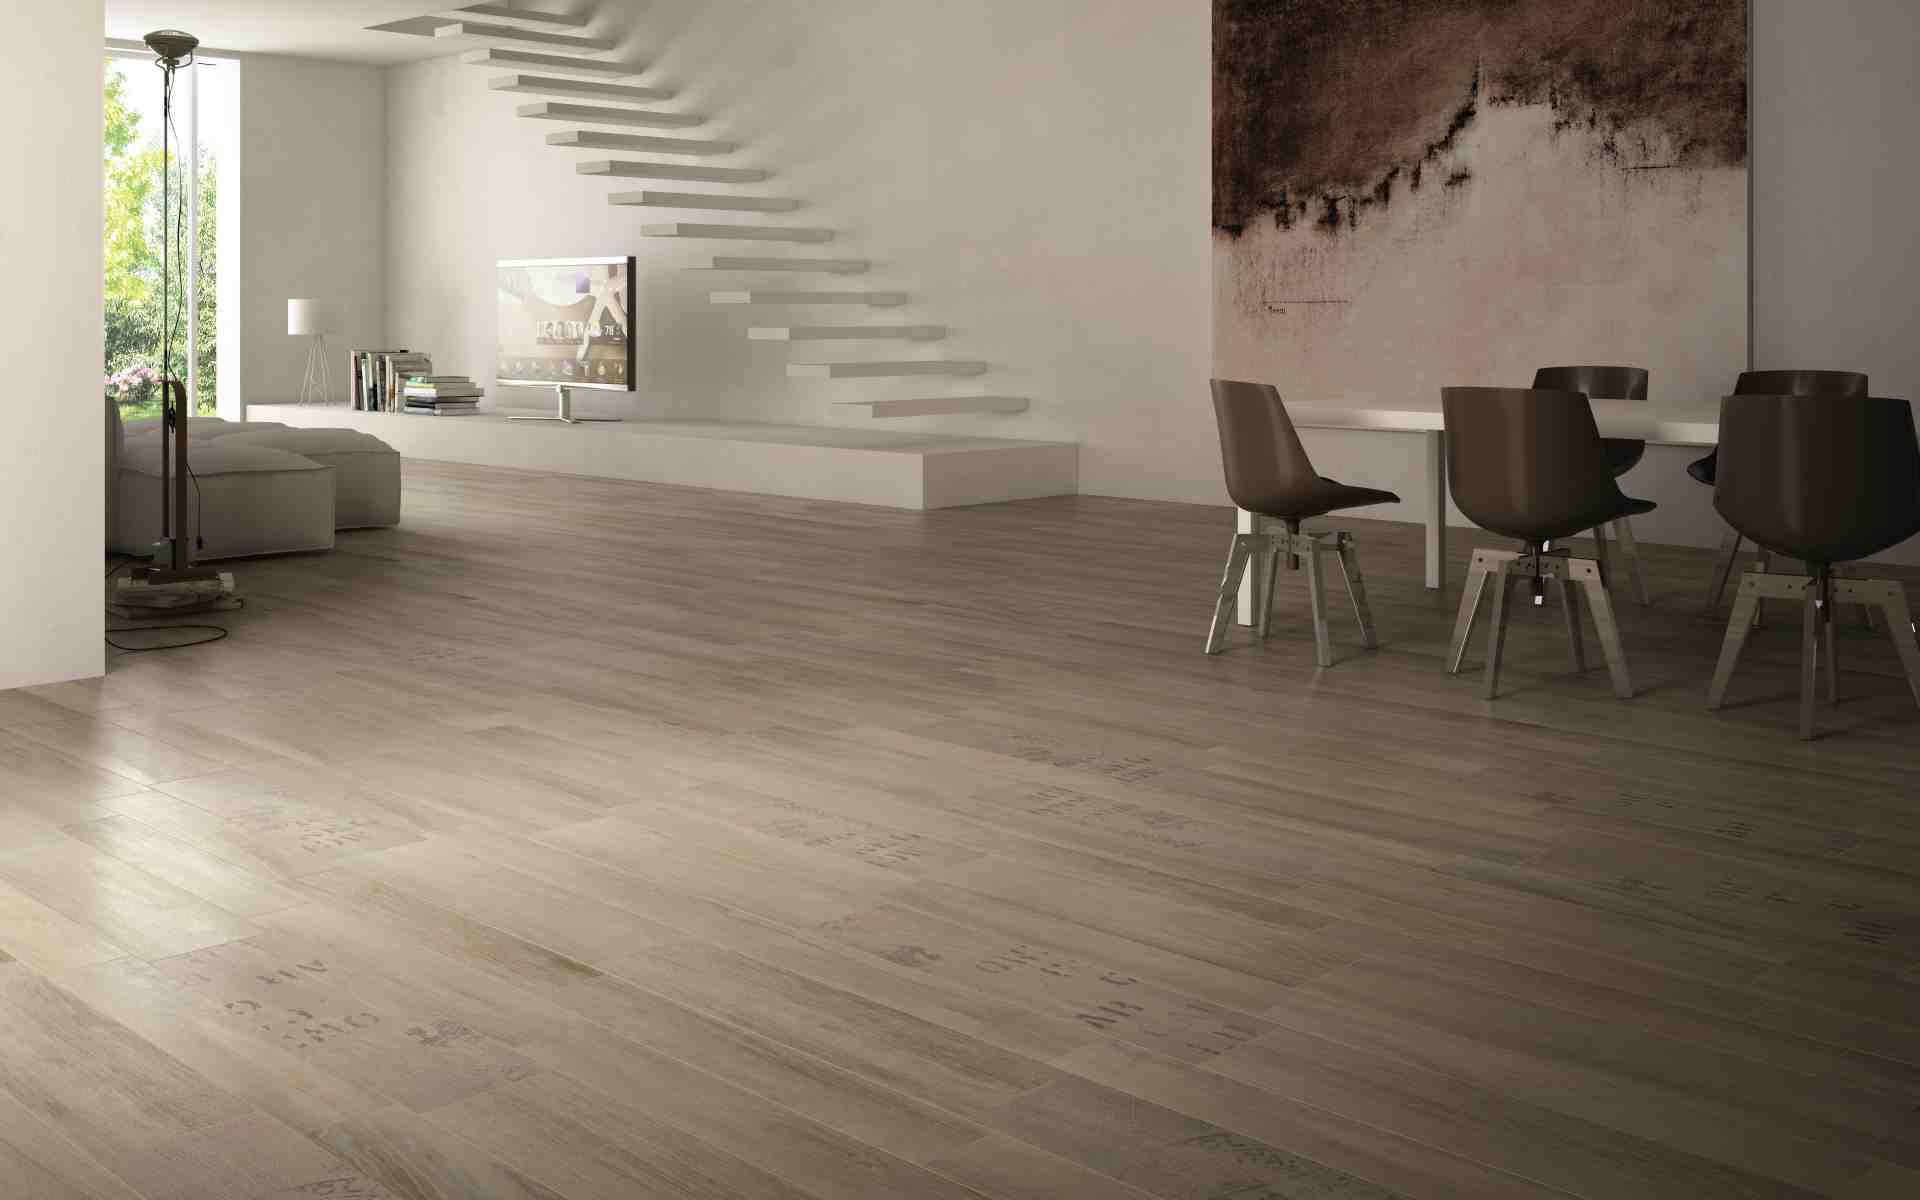 mywood living-clay-13x80-20x80-nat-decoro-mix2pz